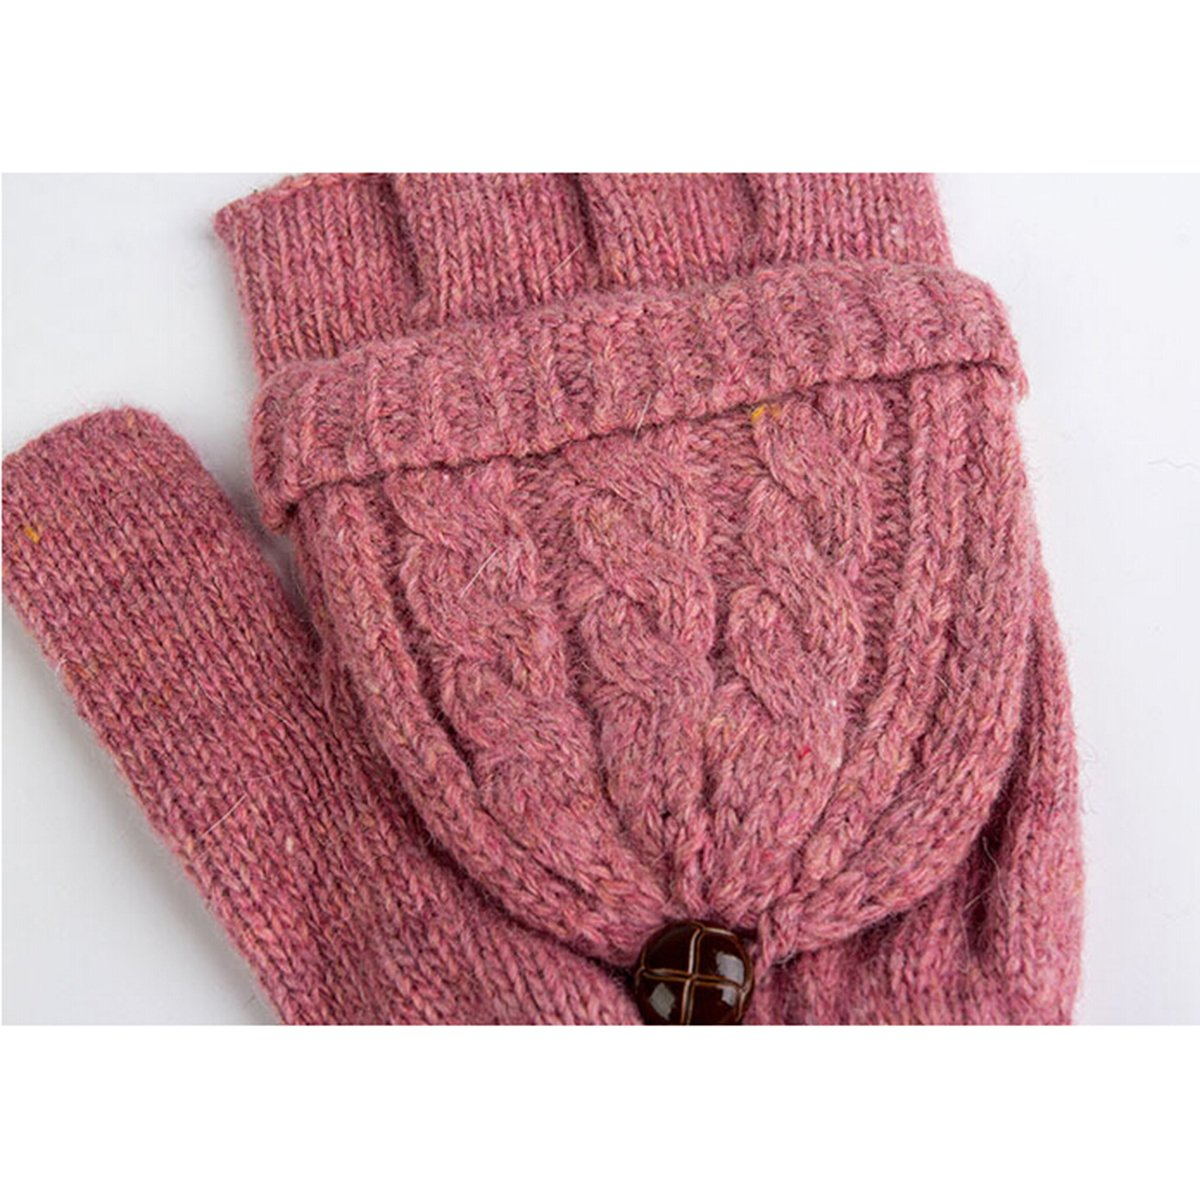 Brown ROSENICE Guanti senza dita donne calda lana maglia guanti con guanto Cover